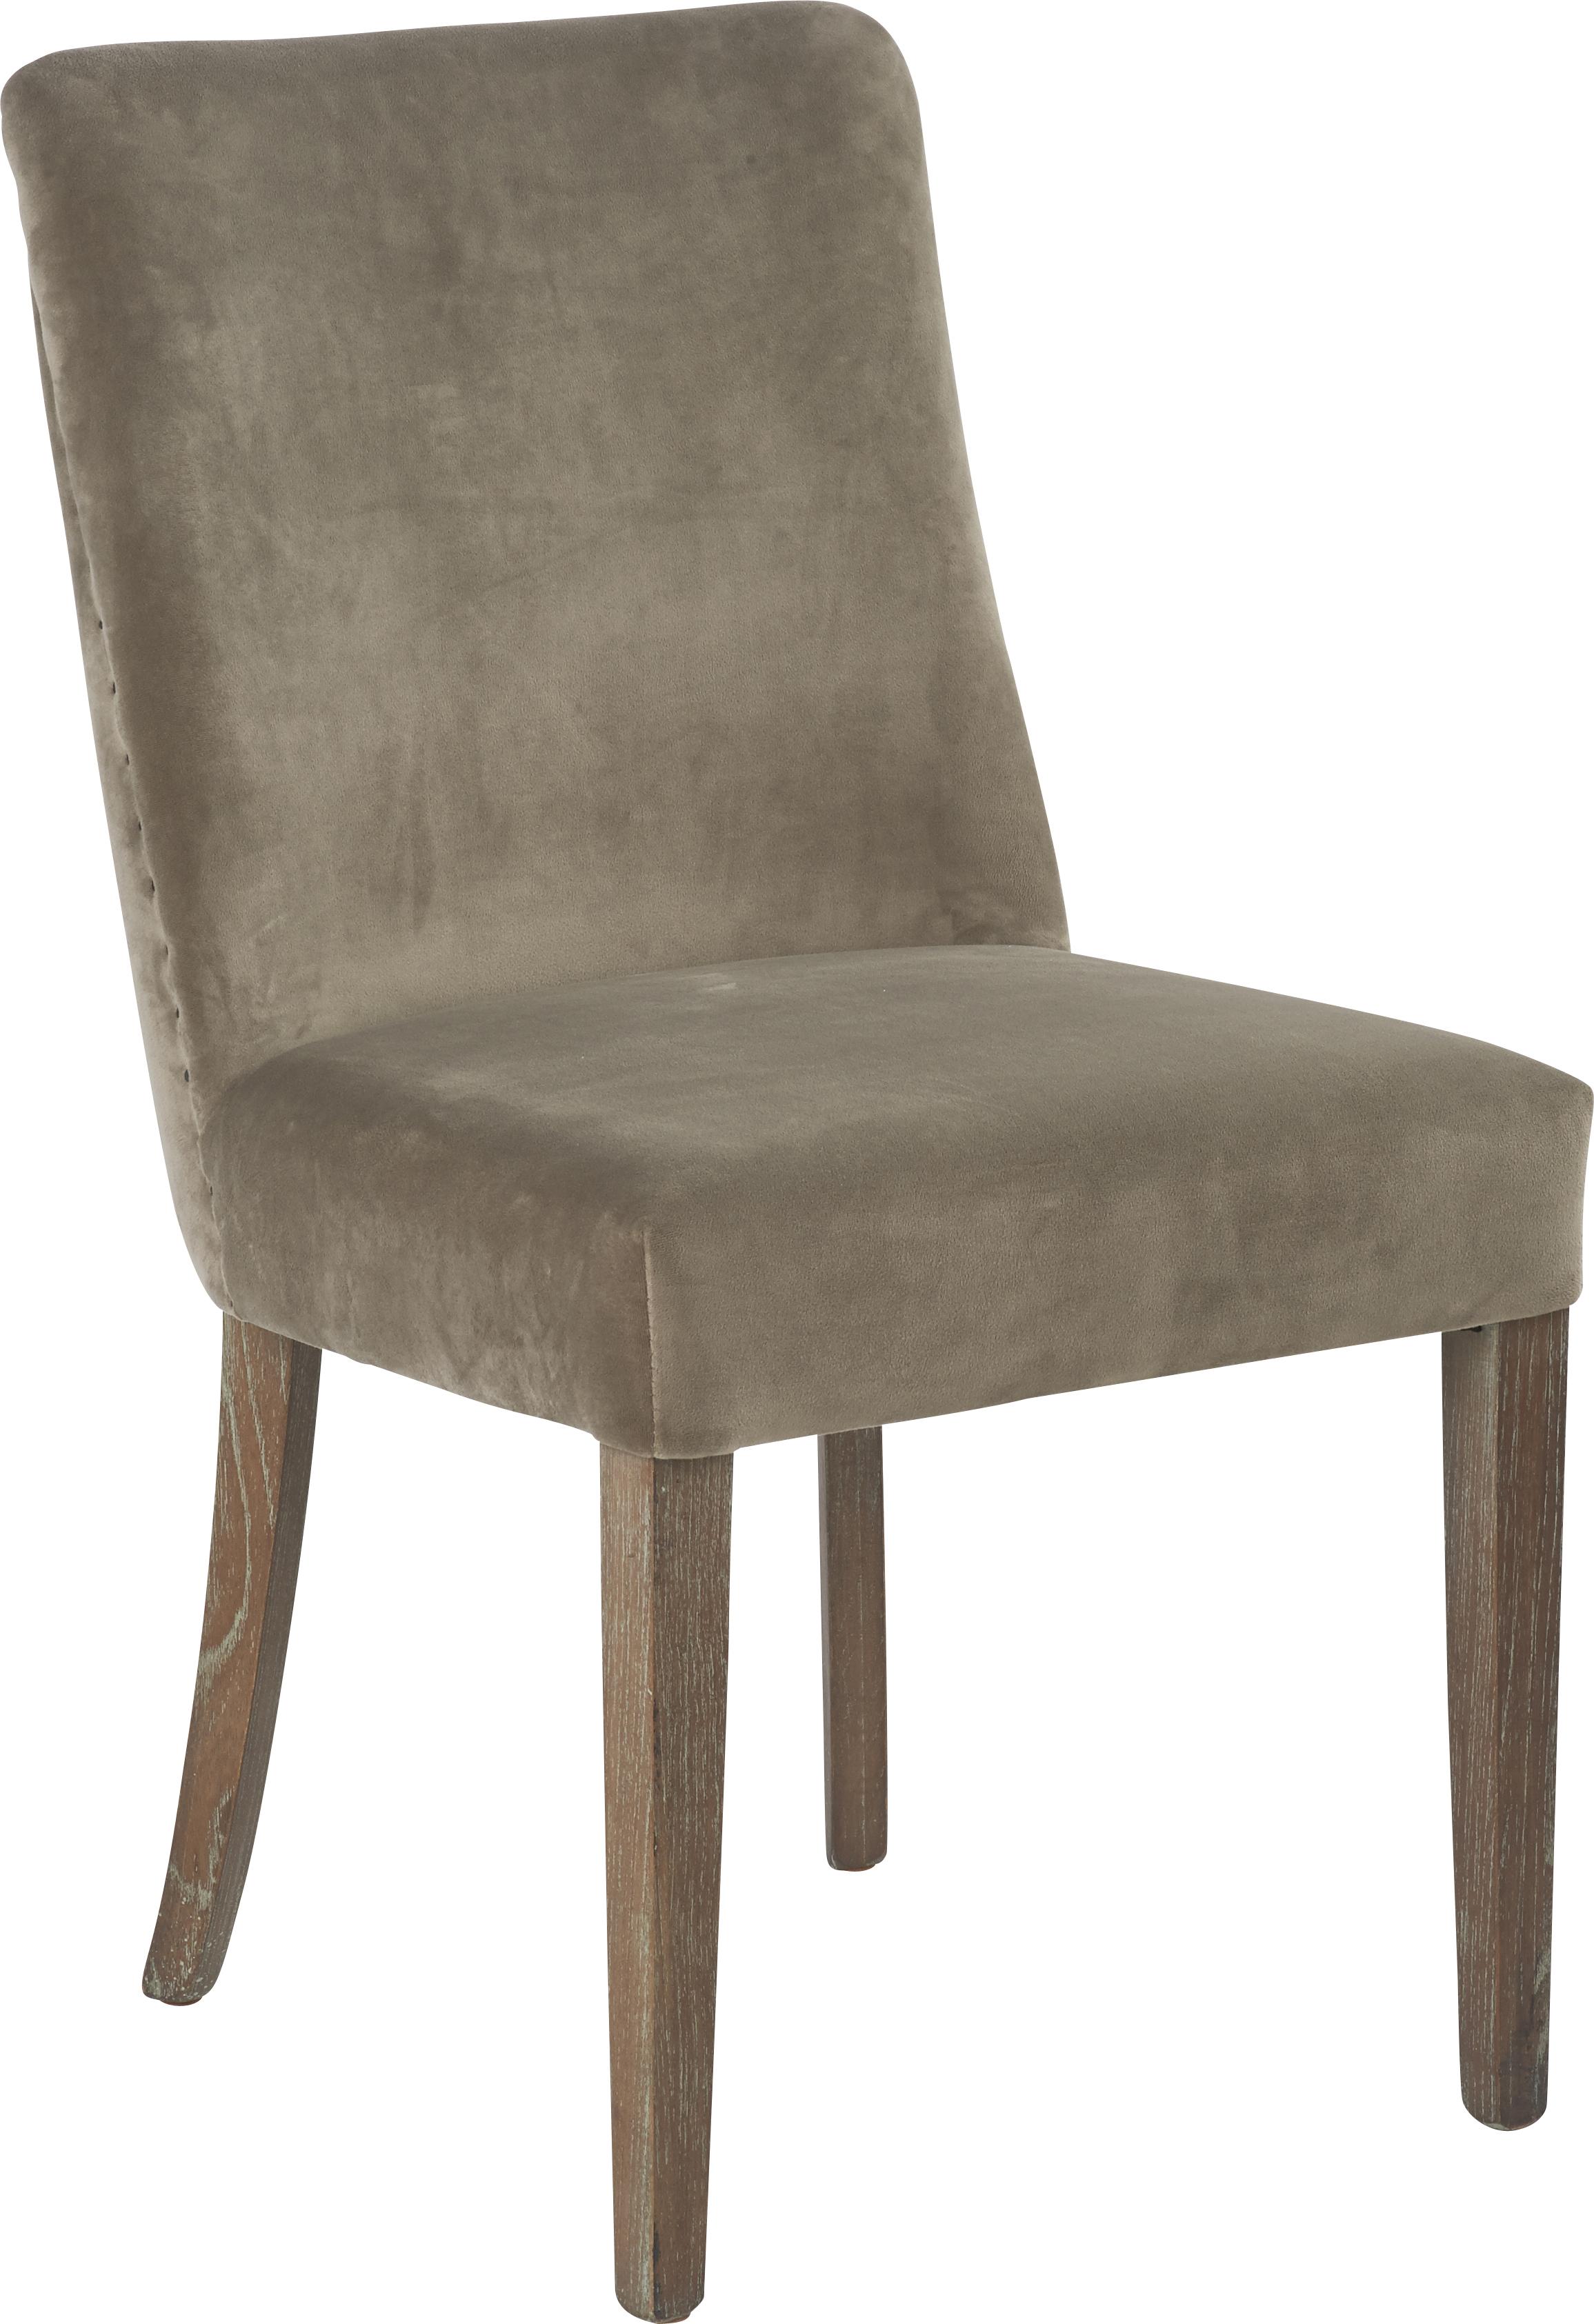 CendreHanjelCour Eva Loges Chaise Chaise Des Eva gYy76vbf